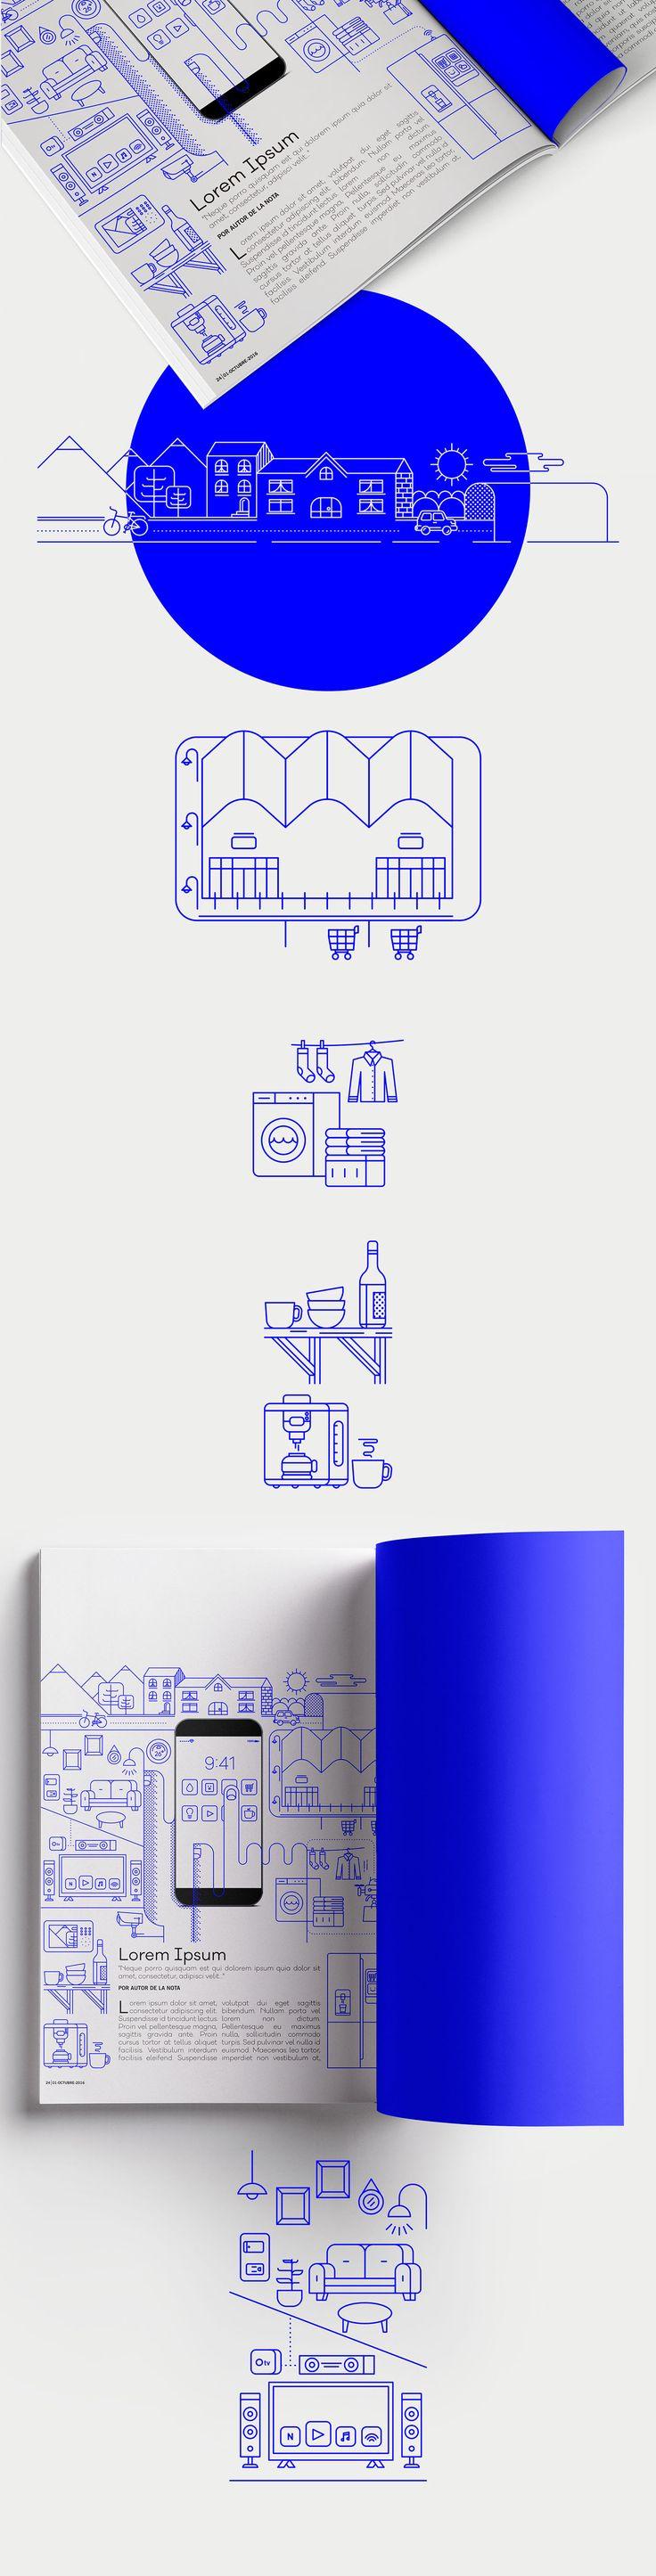 Smart Home. Ilustración Editorial on Behance